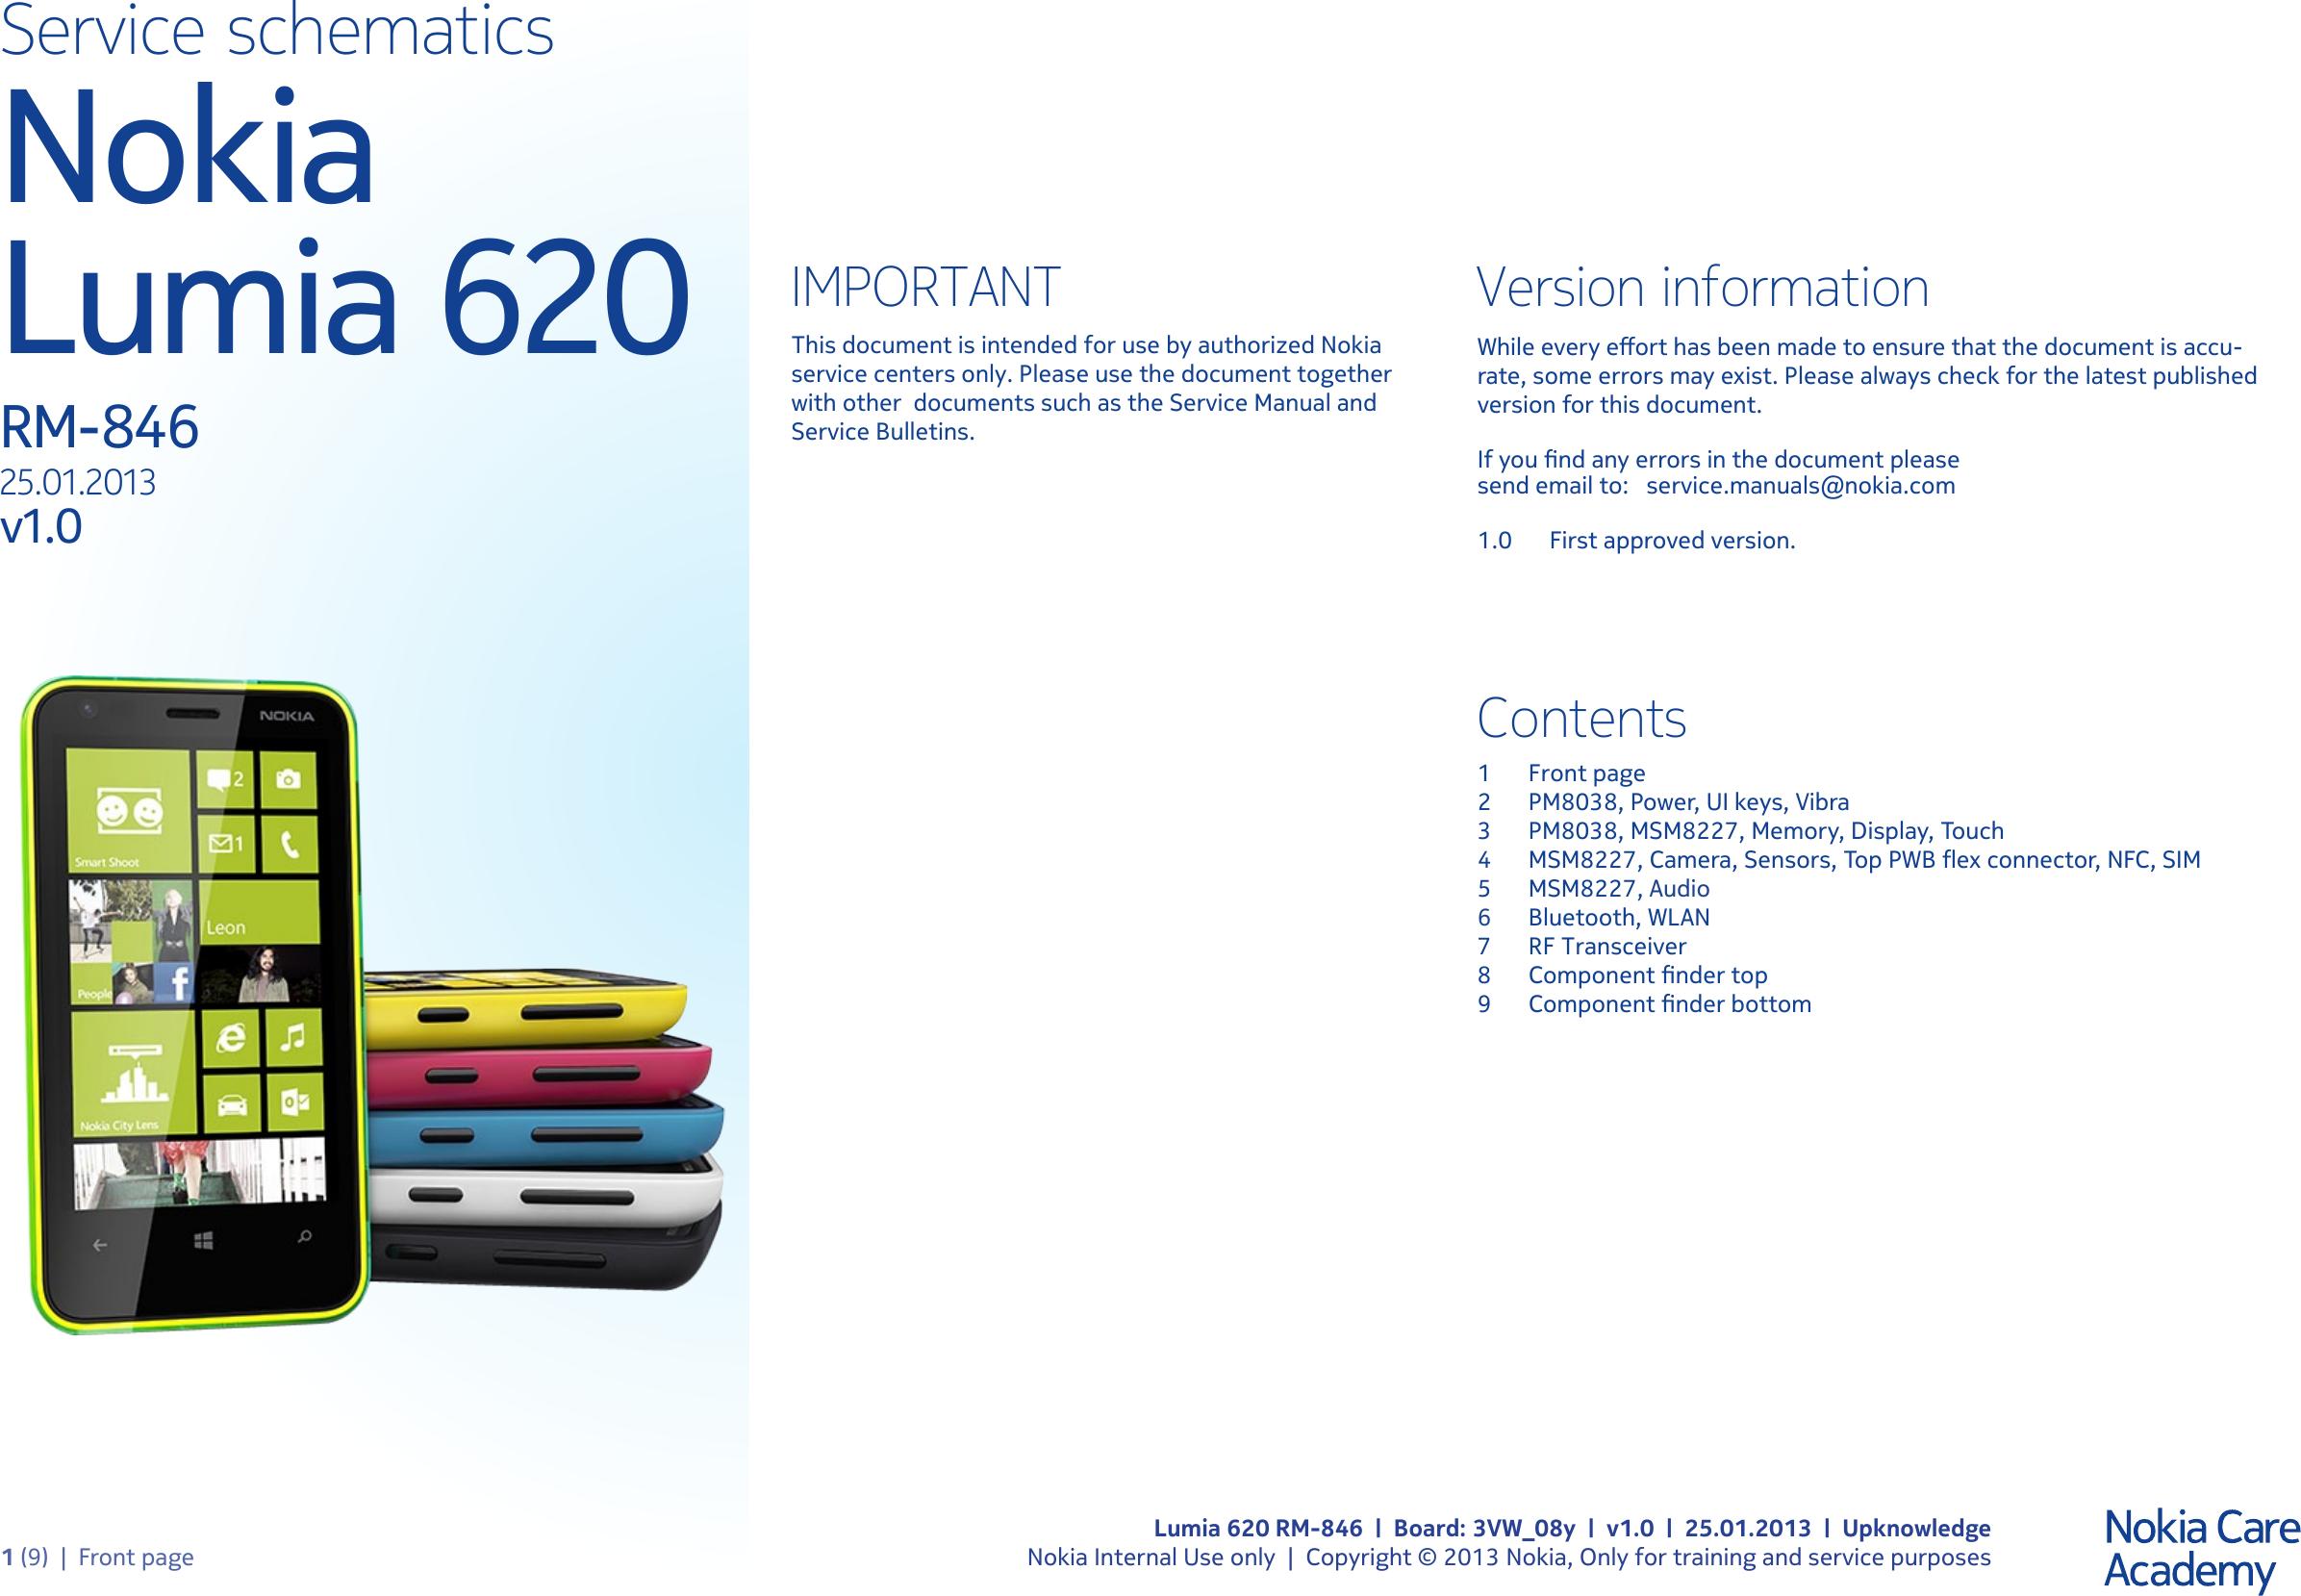 Nokia C6 Service Manual Hp Laserjet 1100a Array Lumia 620 Rm 846 Schematics Www S Manuals Com Rh Usermanual Wiki